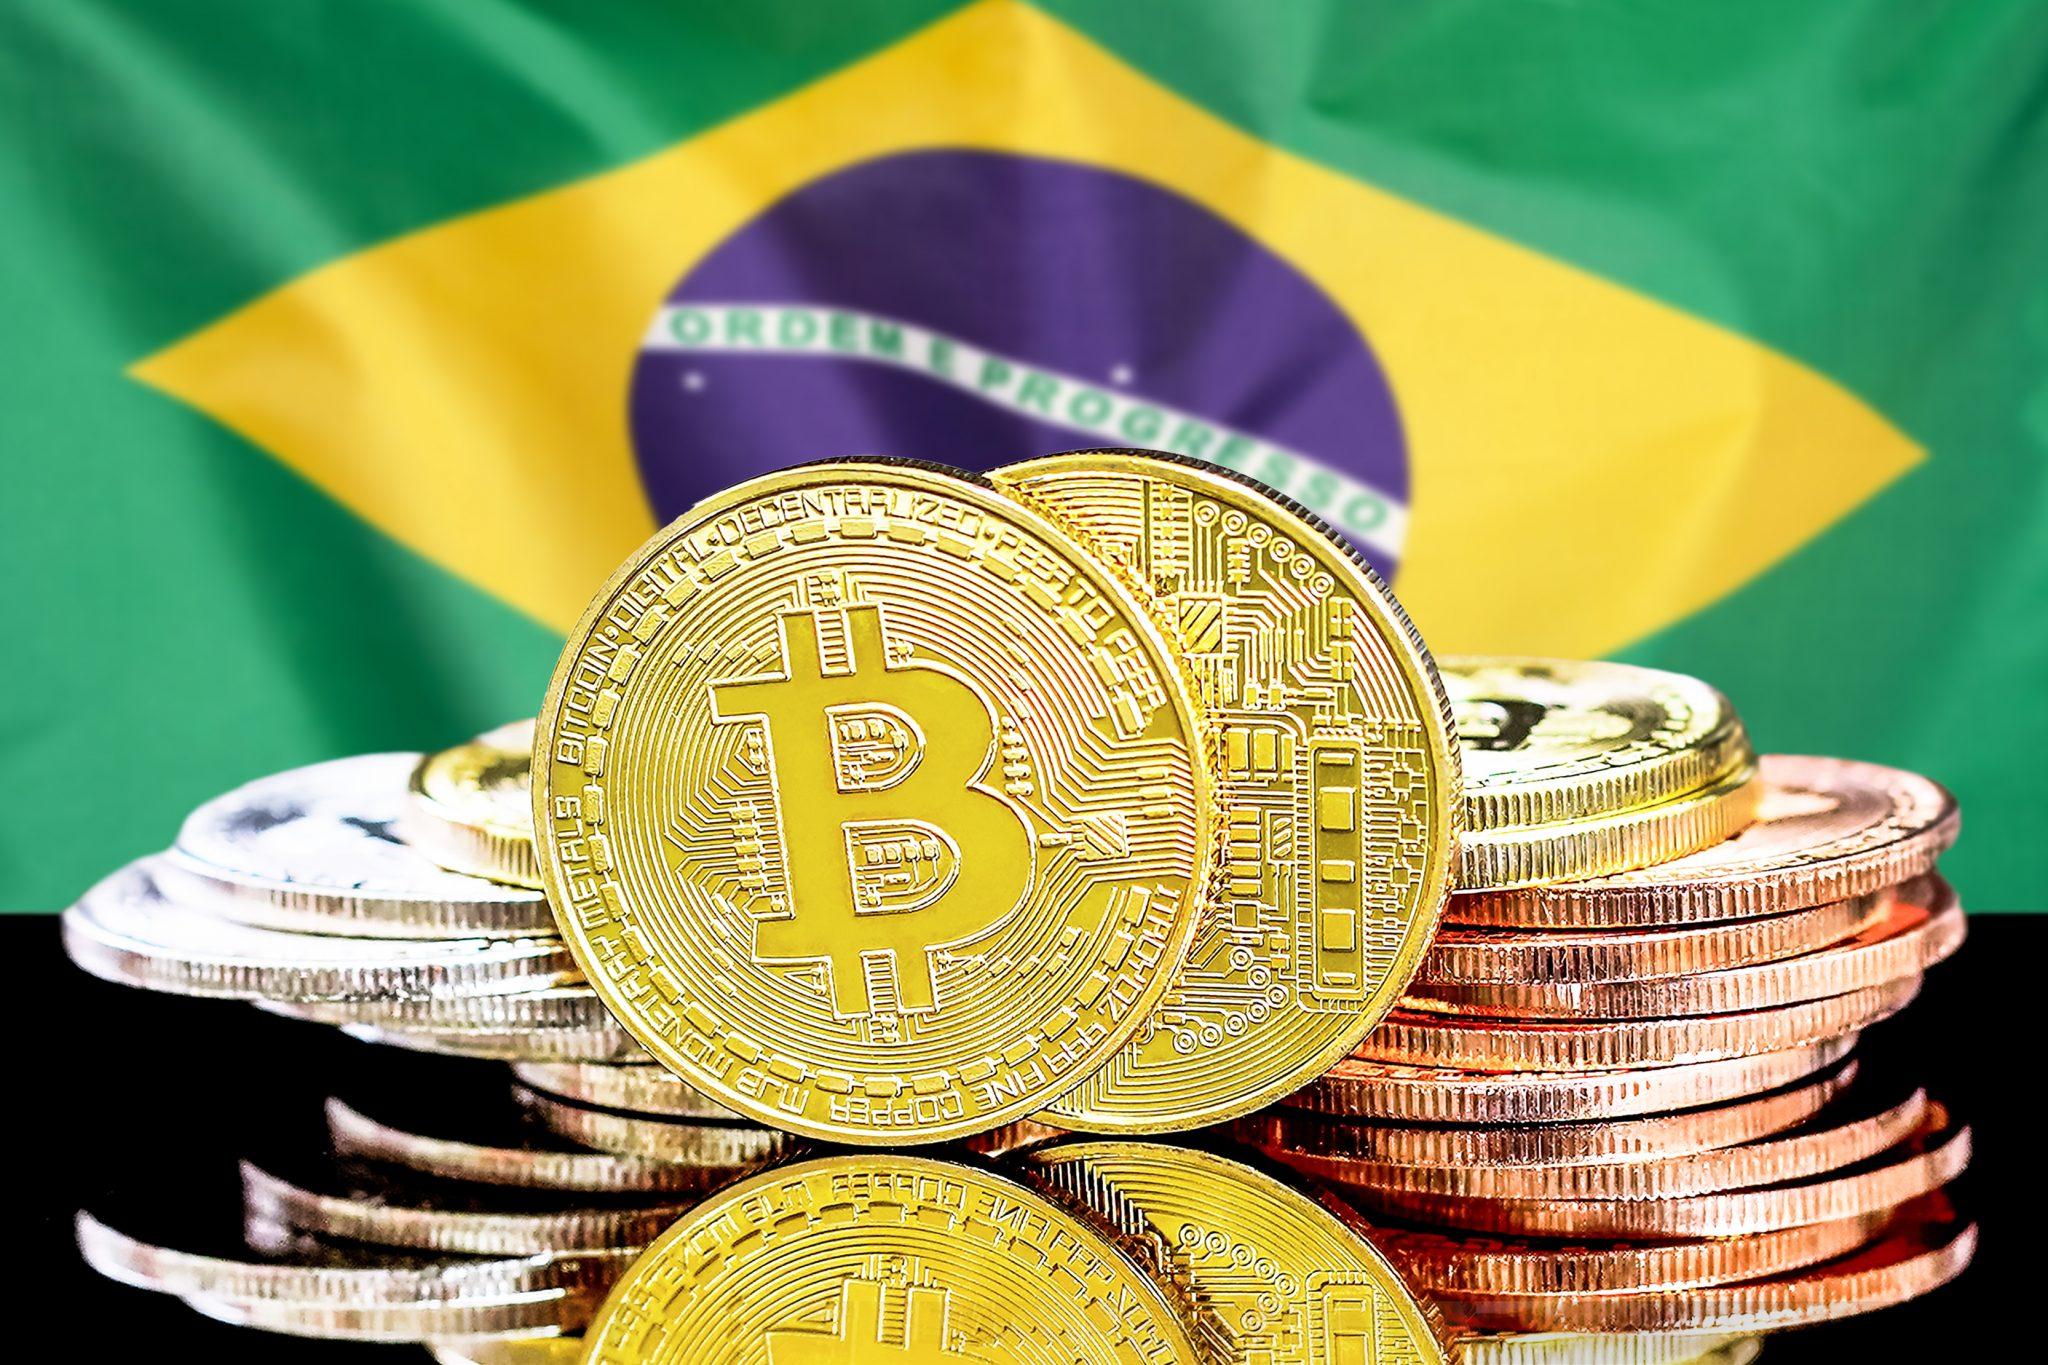 bitcoins on Brazil flag background